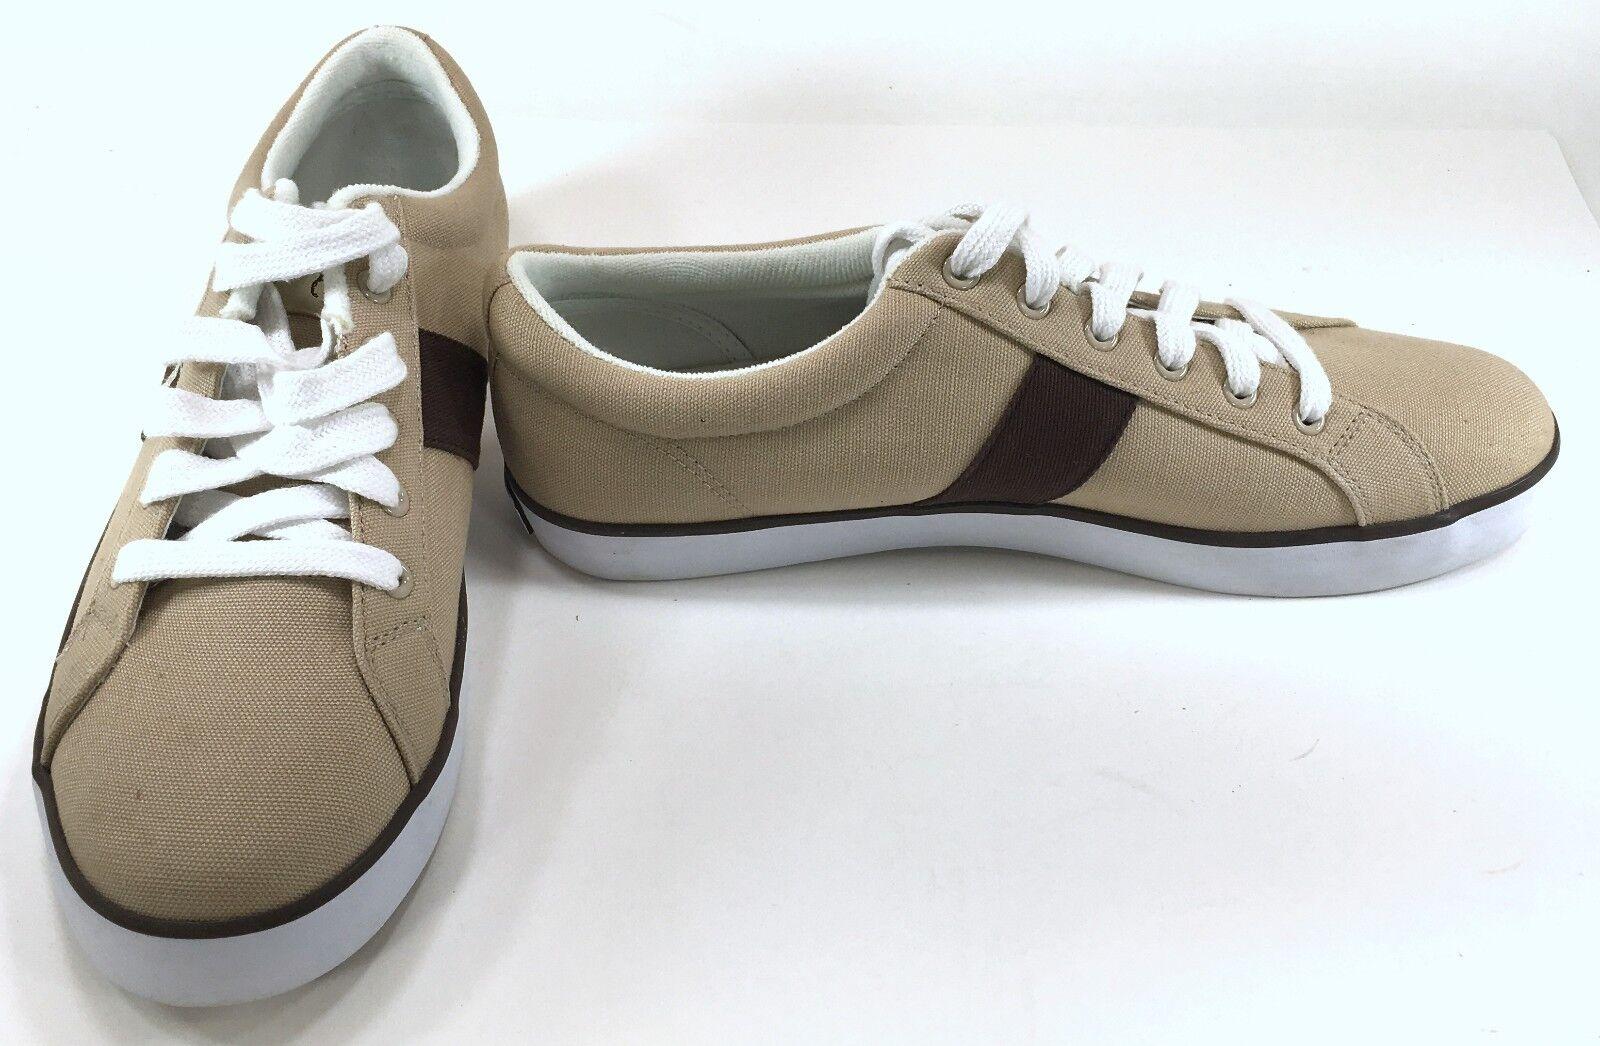 Polo Ralph Lauren shoes Harold Canvas Khaki Chocolate Sneakers Size 12